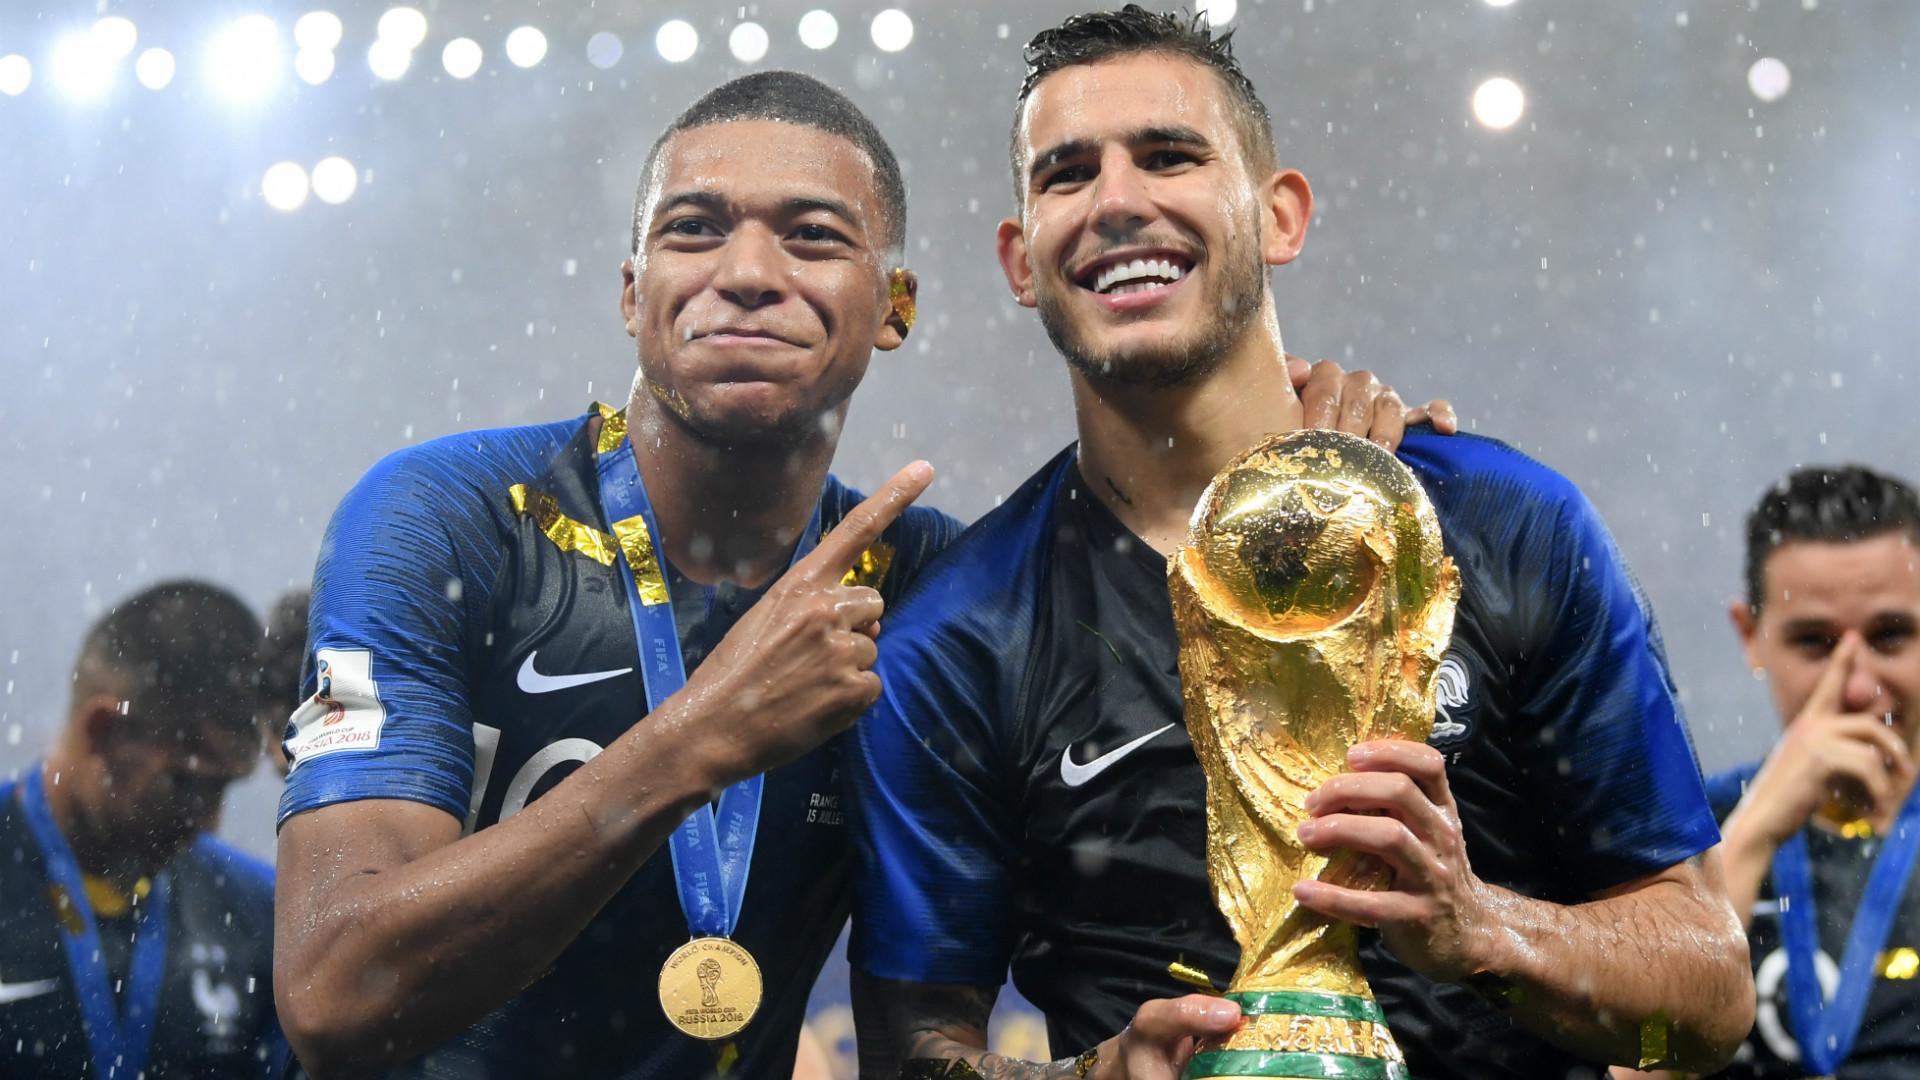 International : La France s'impose face aux Pays-Bas. Giroud marque enfin